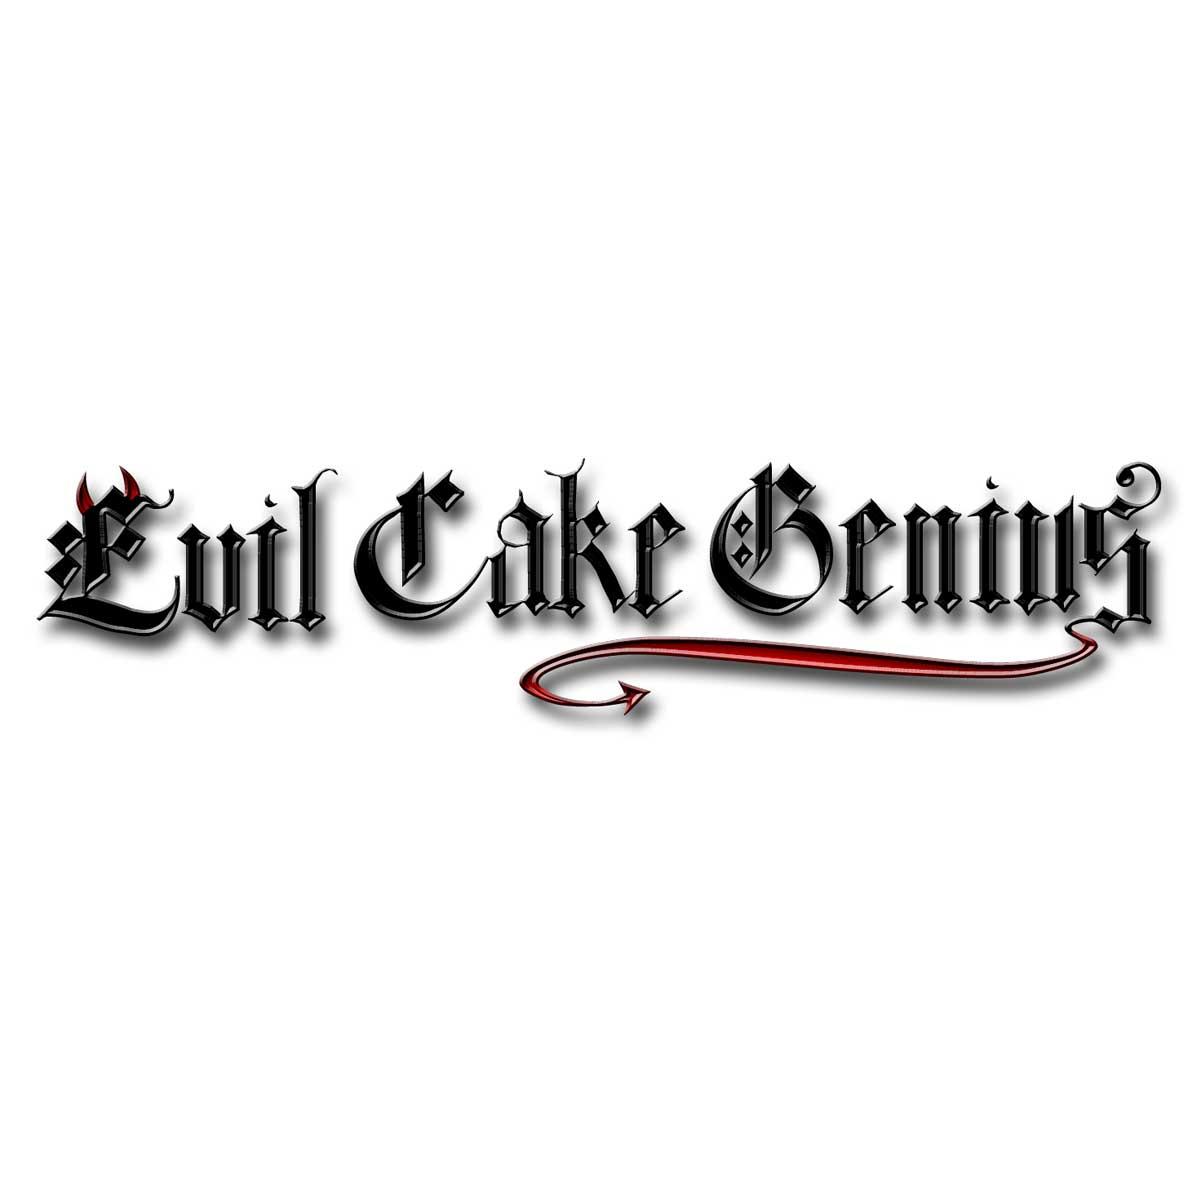 Cake Pan Wraps Medium Evil Cake Genius